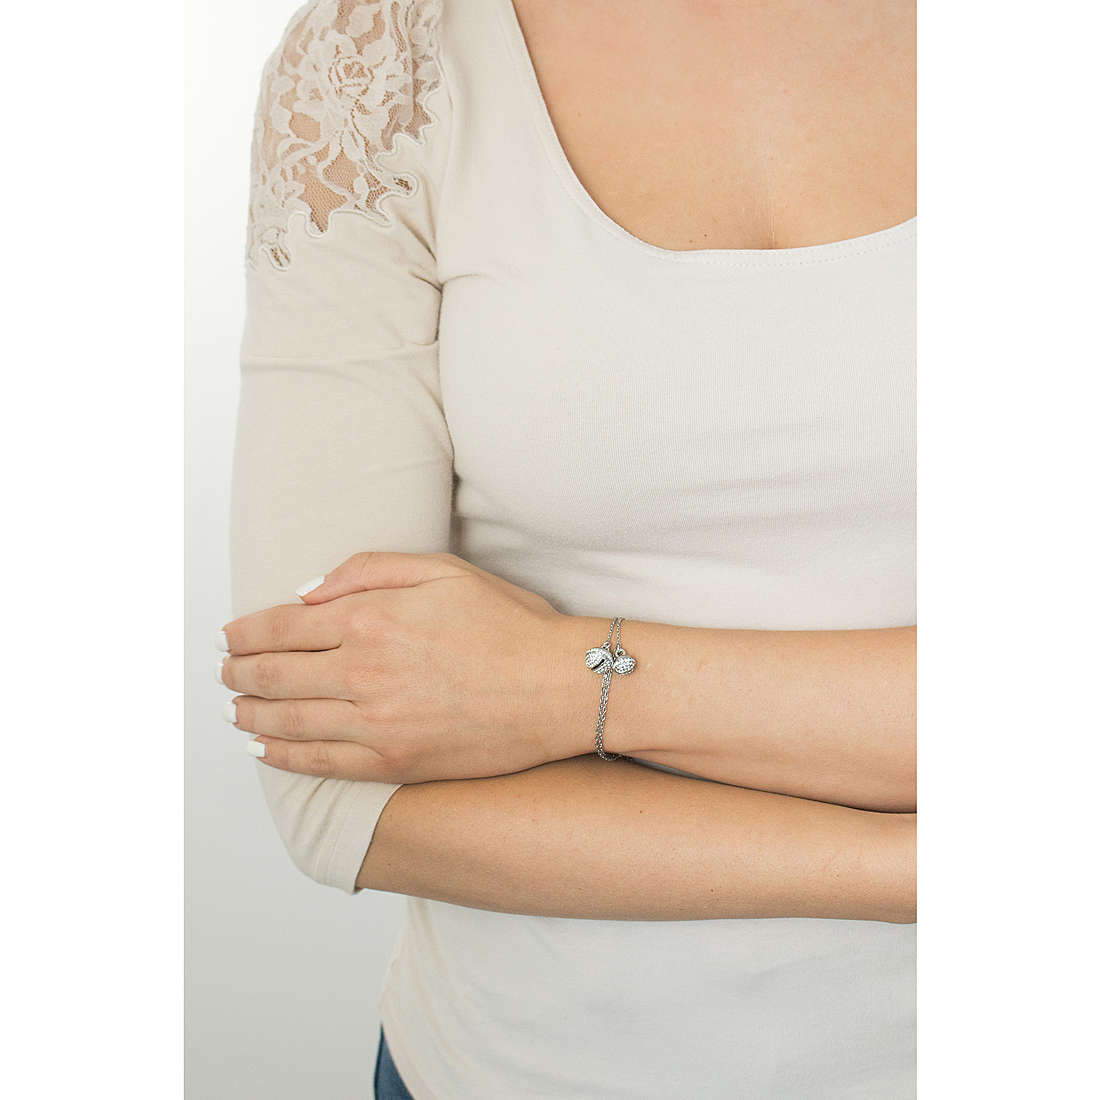 Luca Barra bracciali Giuly donna LBBK1087 indosso